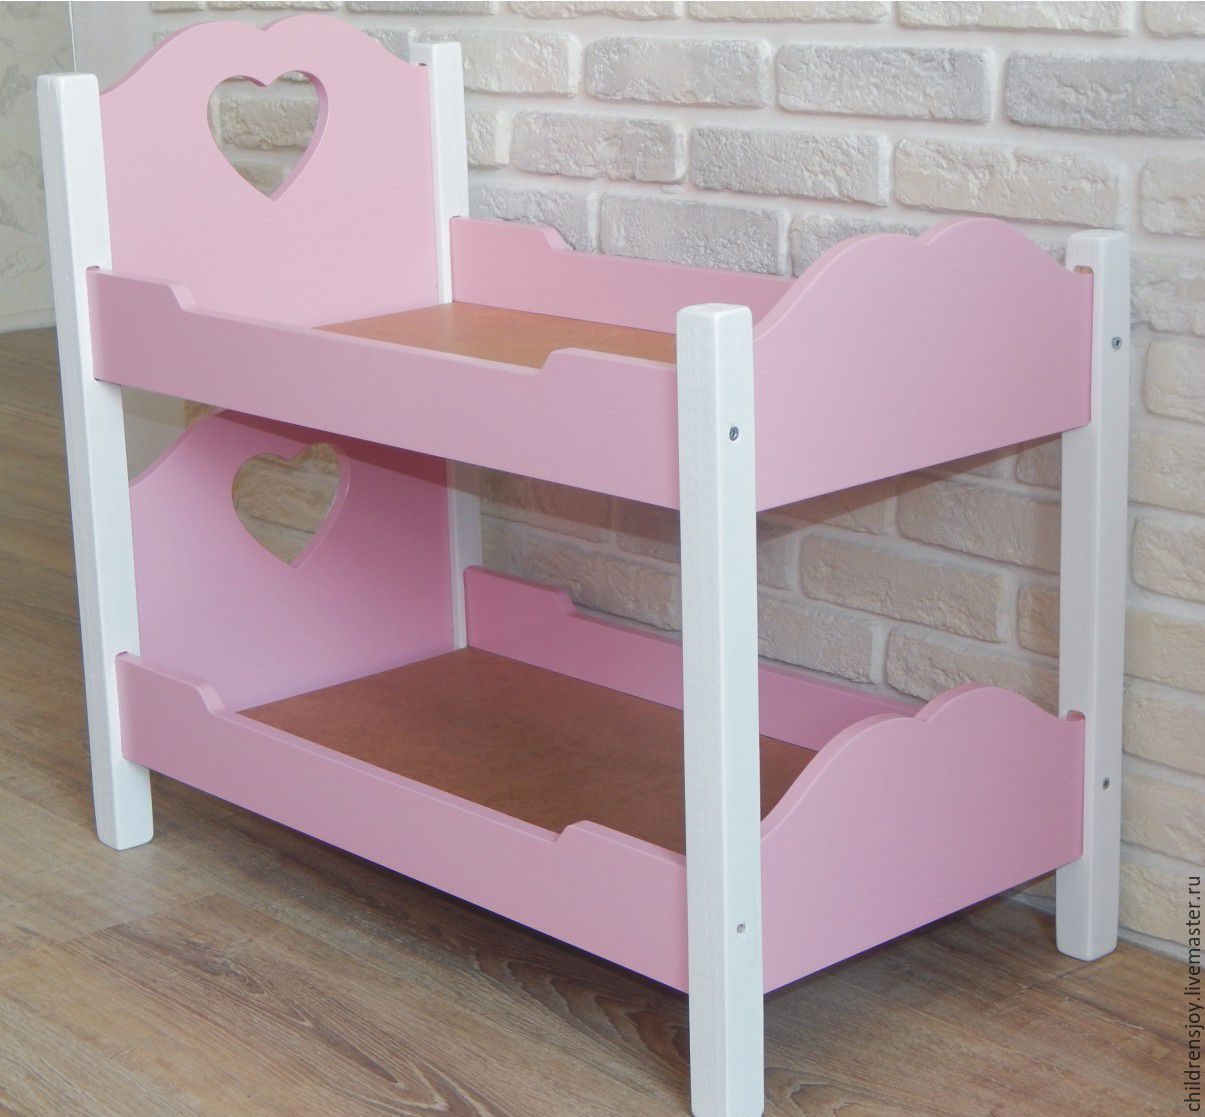 Двухъярусная кровать для кукол розовая из пластика